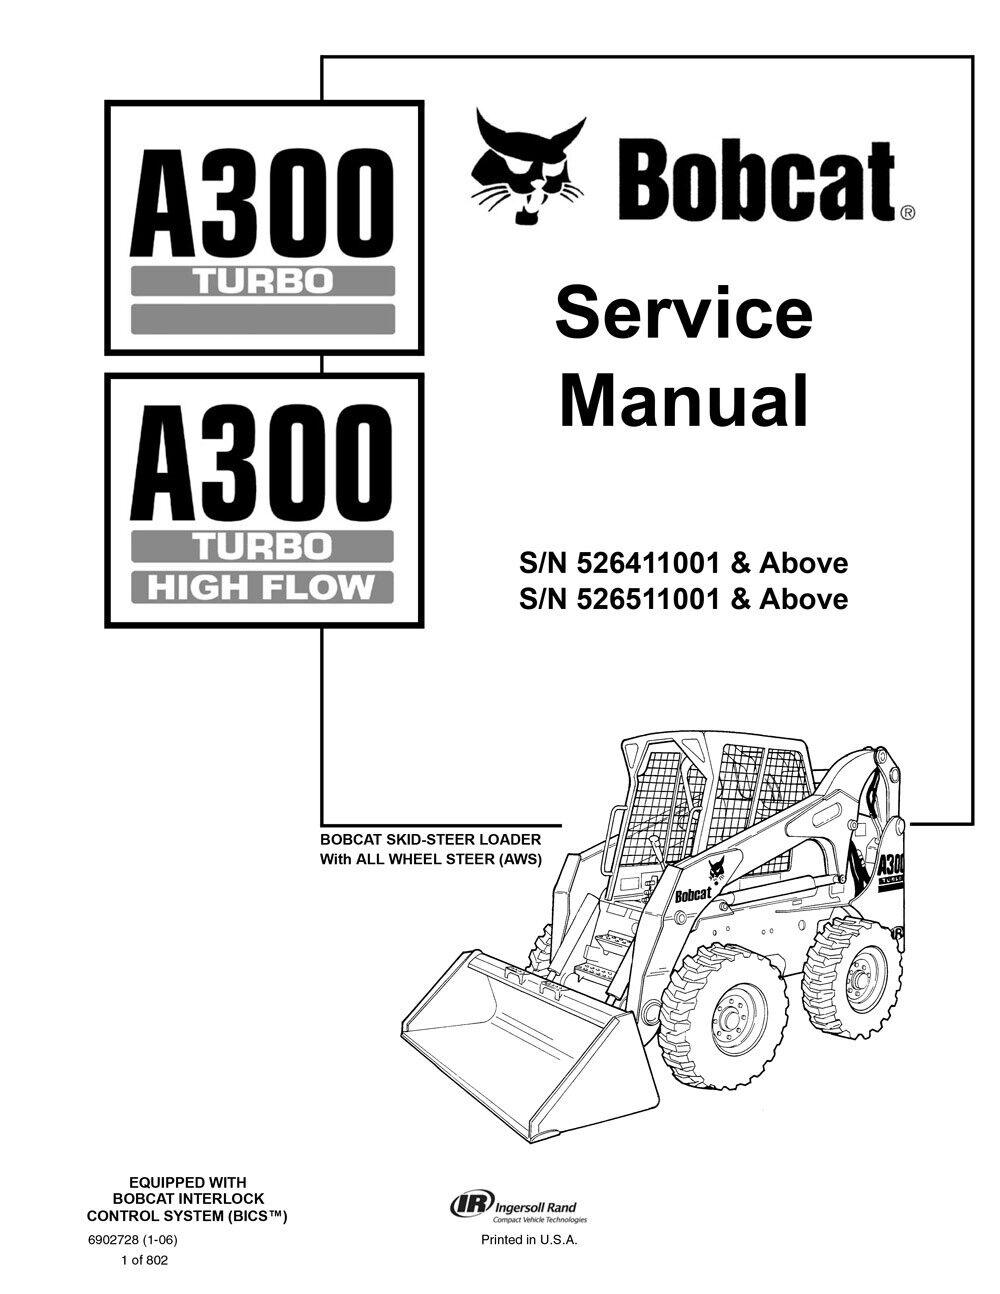 Bobcat A300 Turbo & Highflow All Wheel Steer 2006 Edition